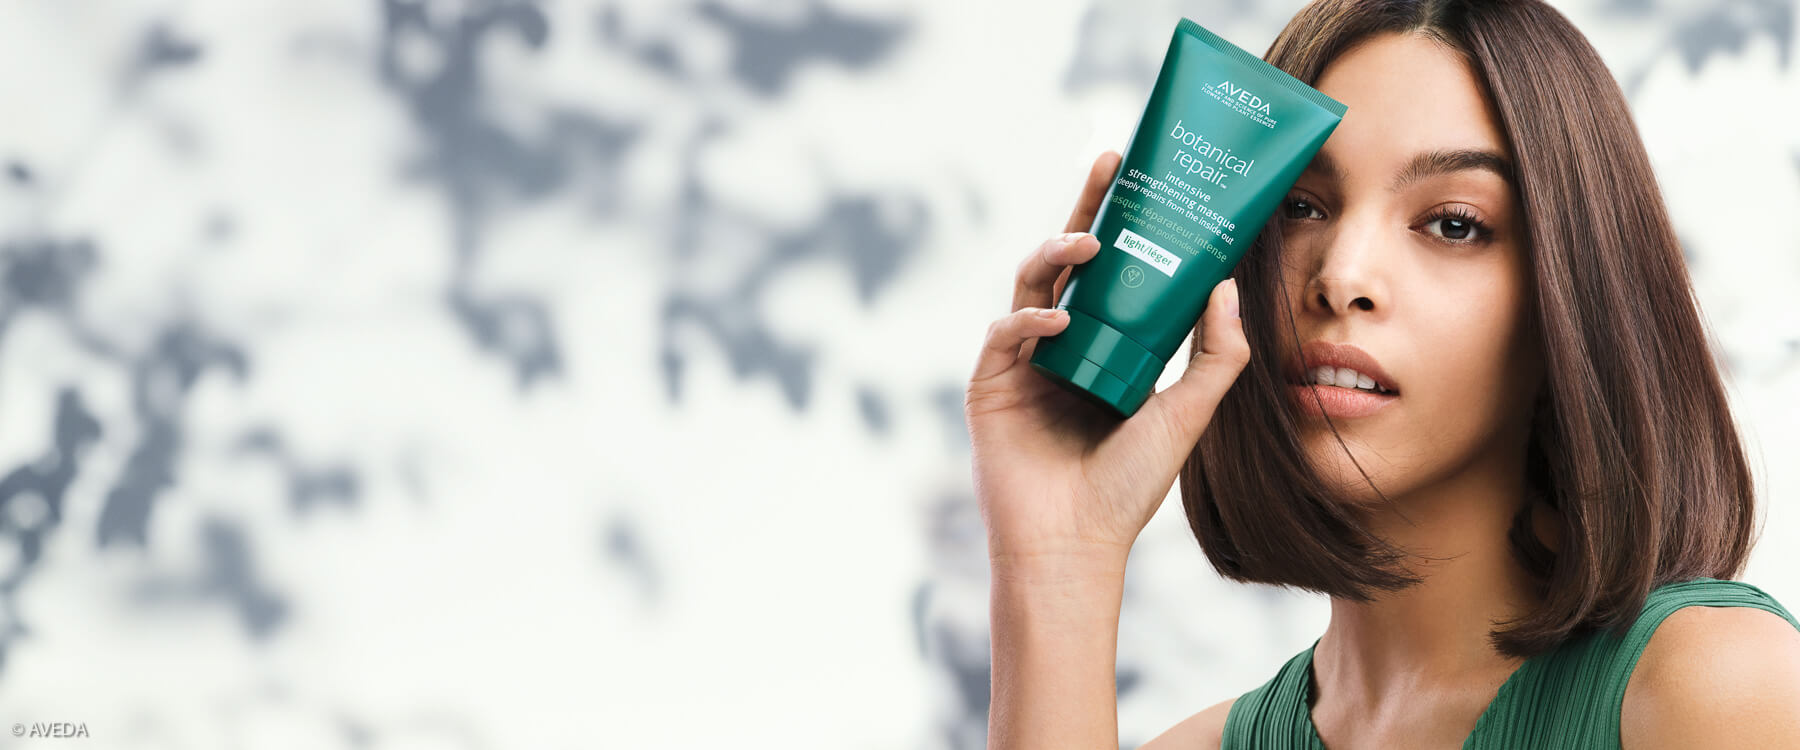 AVEDA Botanical Repair™ für starke, gesunde Haare | AVEDA Concept Salon Daniel Schmid Reutlingen